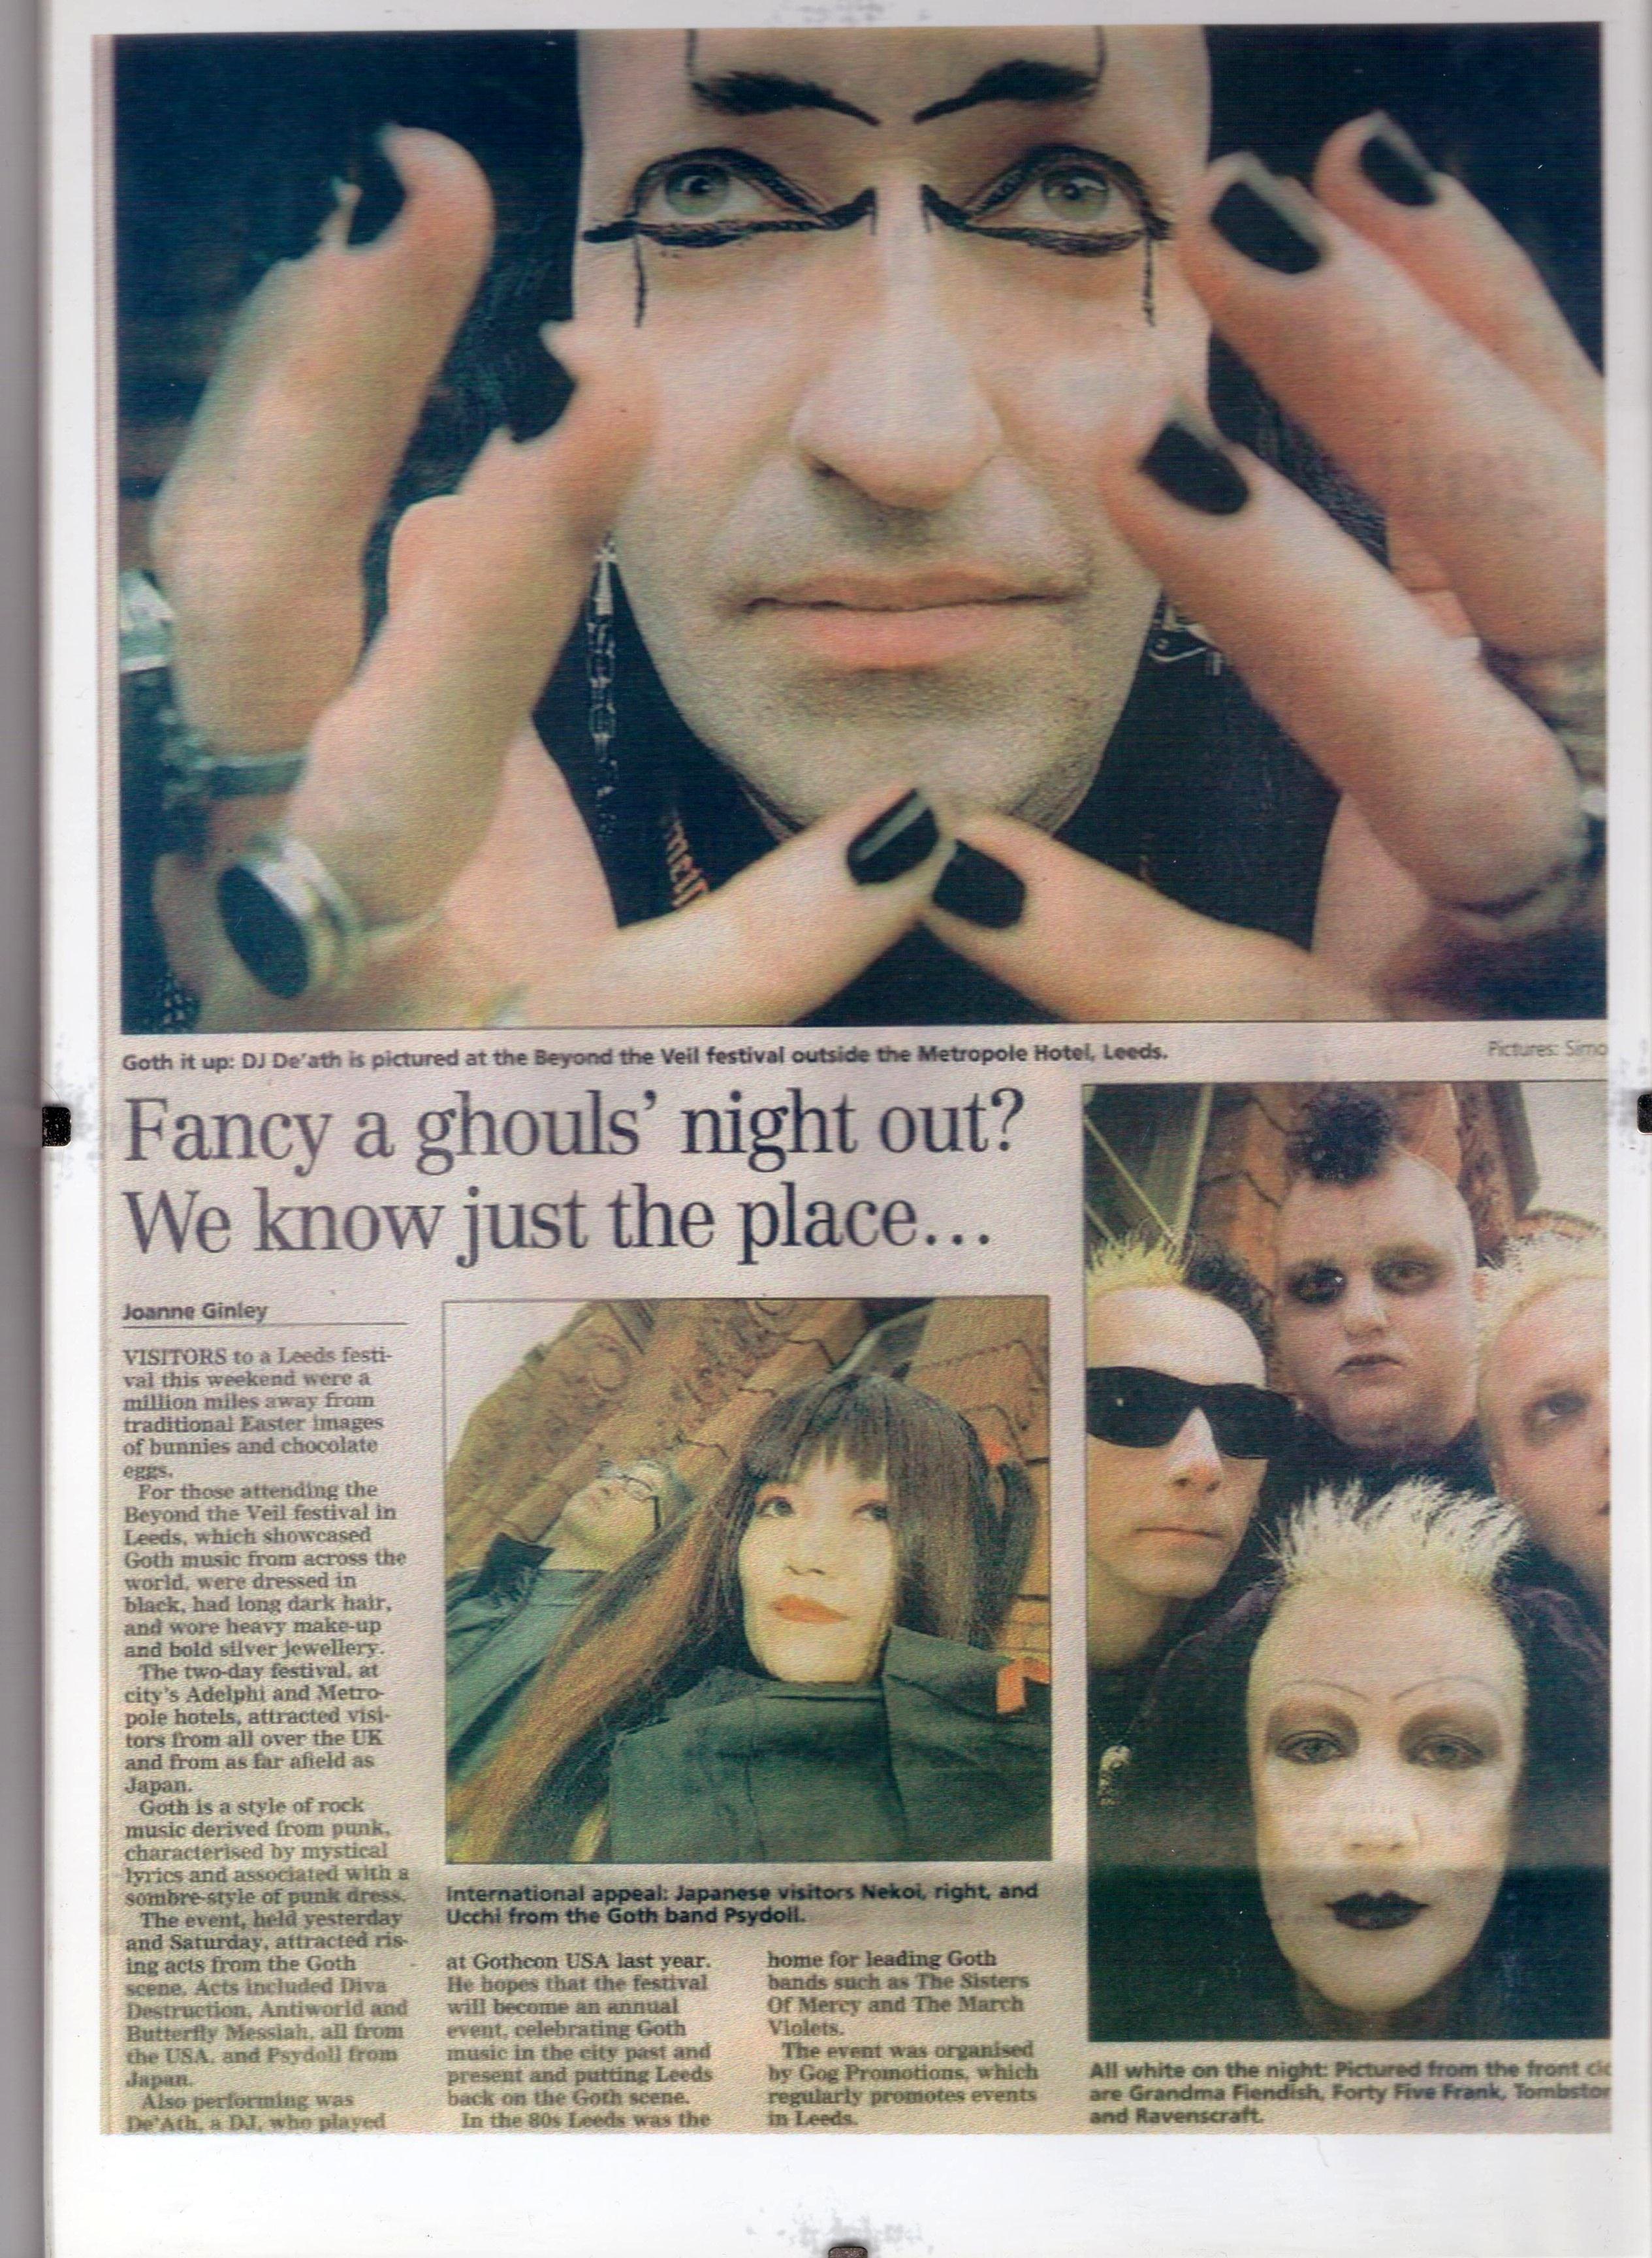 Beyond The Veil 2003 festival YEP feature